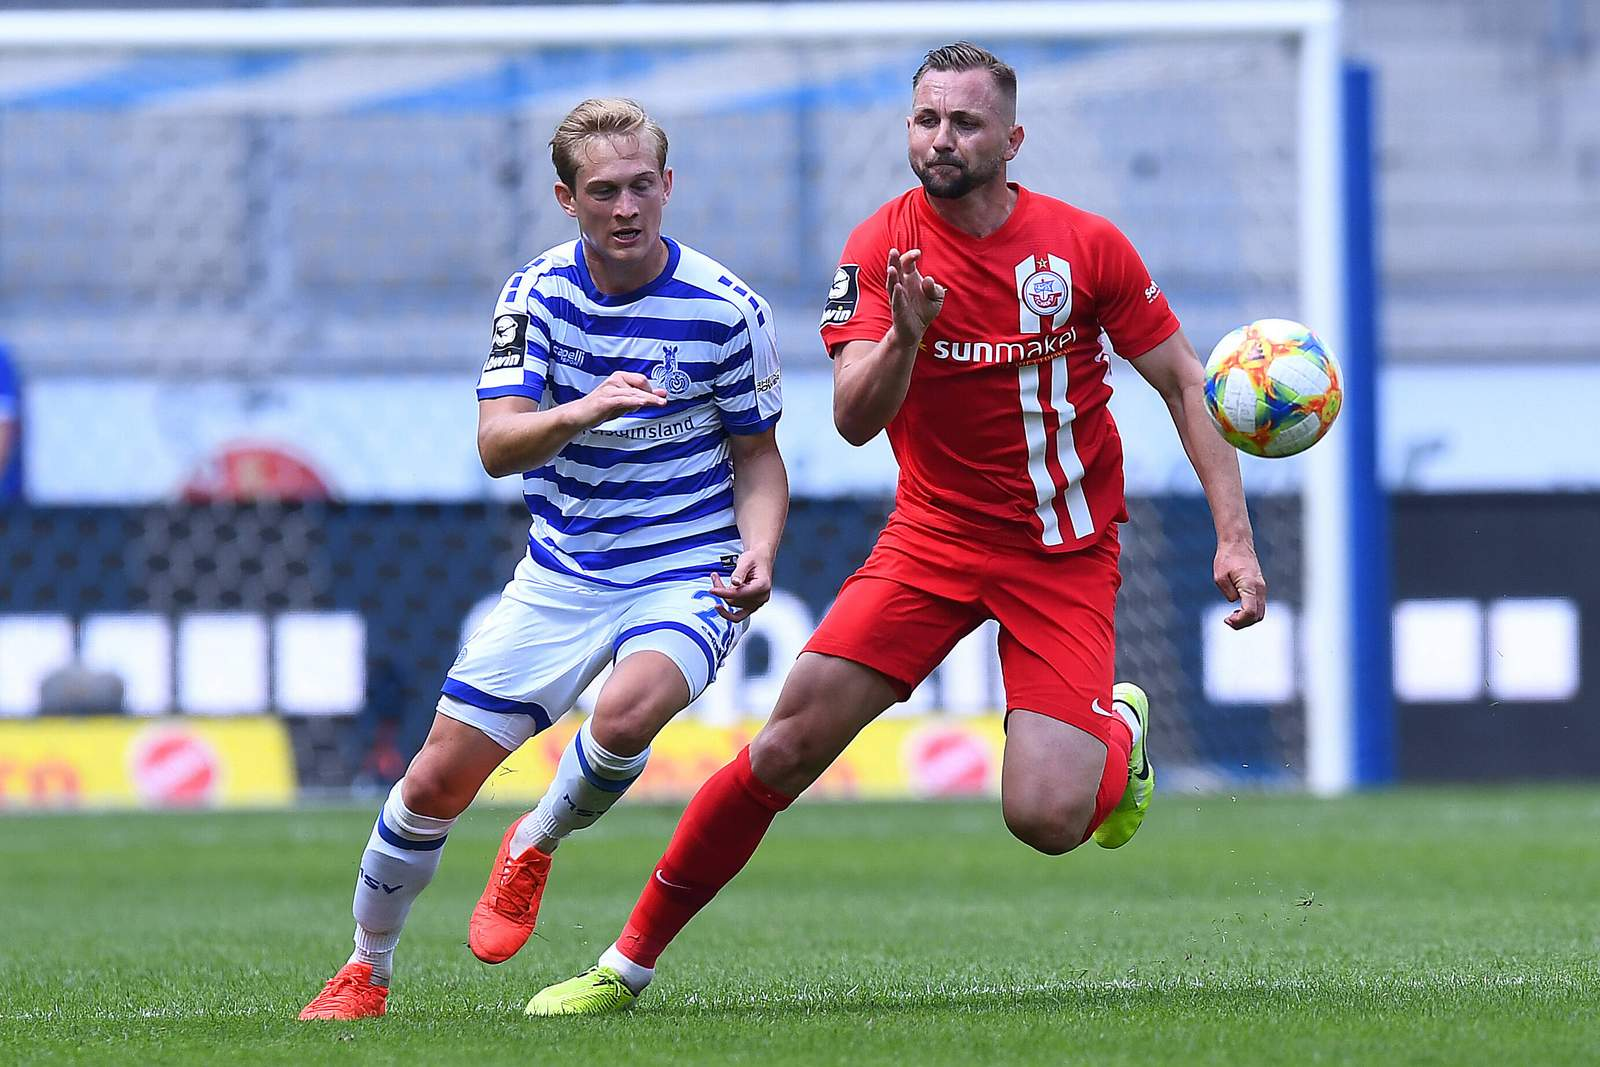 Maximilian Jansen gegen John Verhoek. Jetzt auf Hansa Rostock vs MSV Duisburg wetten